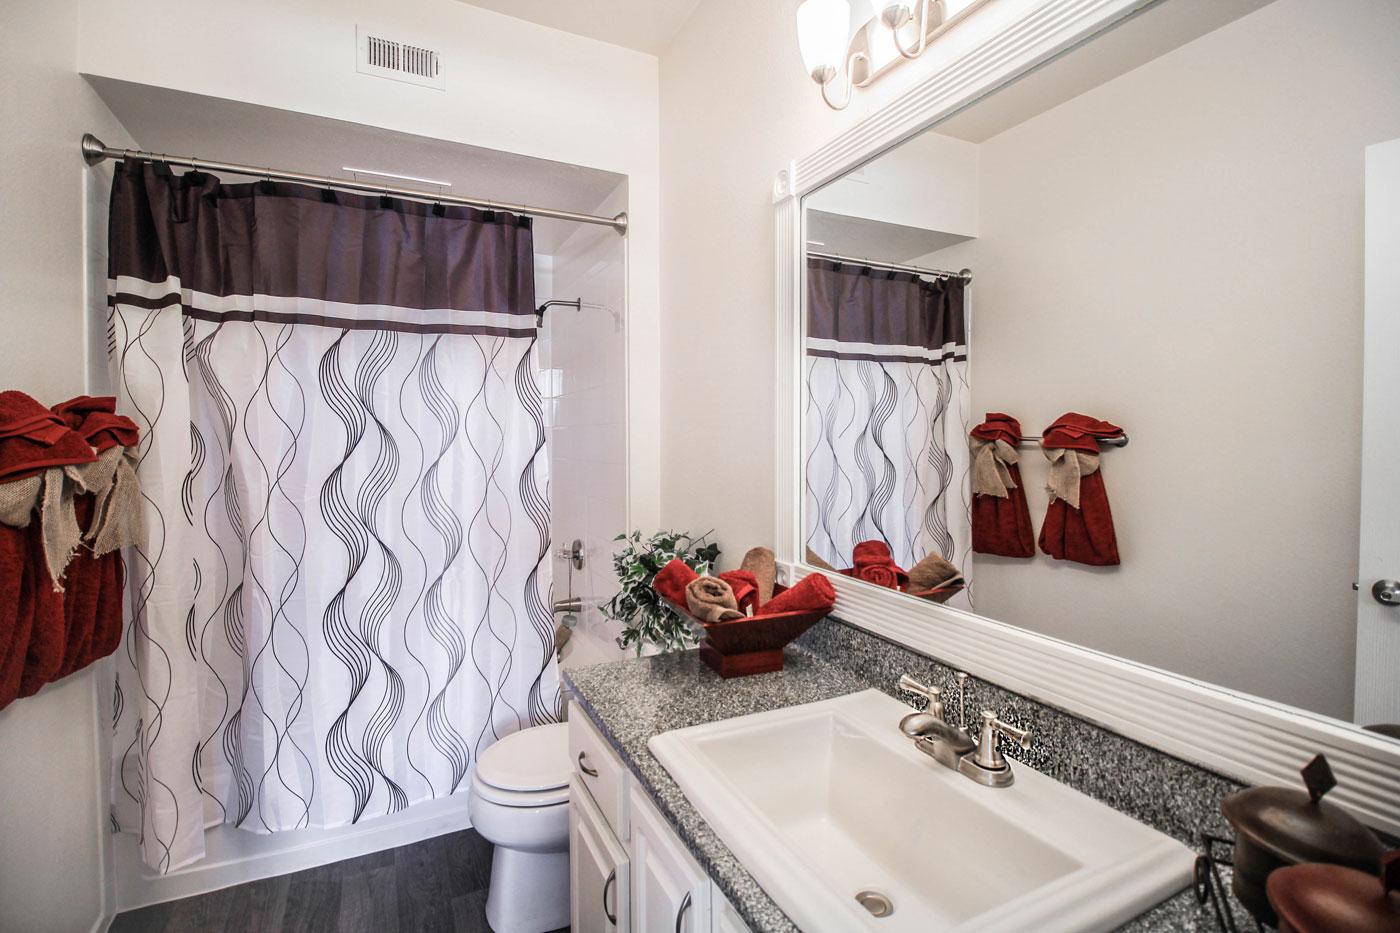 Full bathroom at San Tropez in Las Vegas.